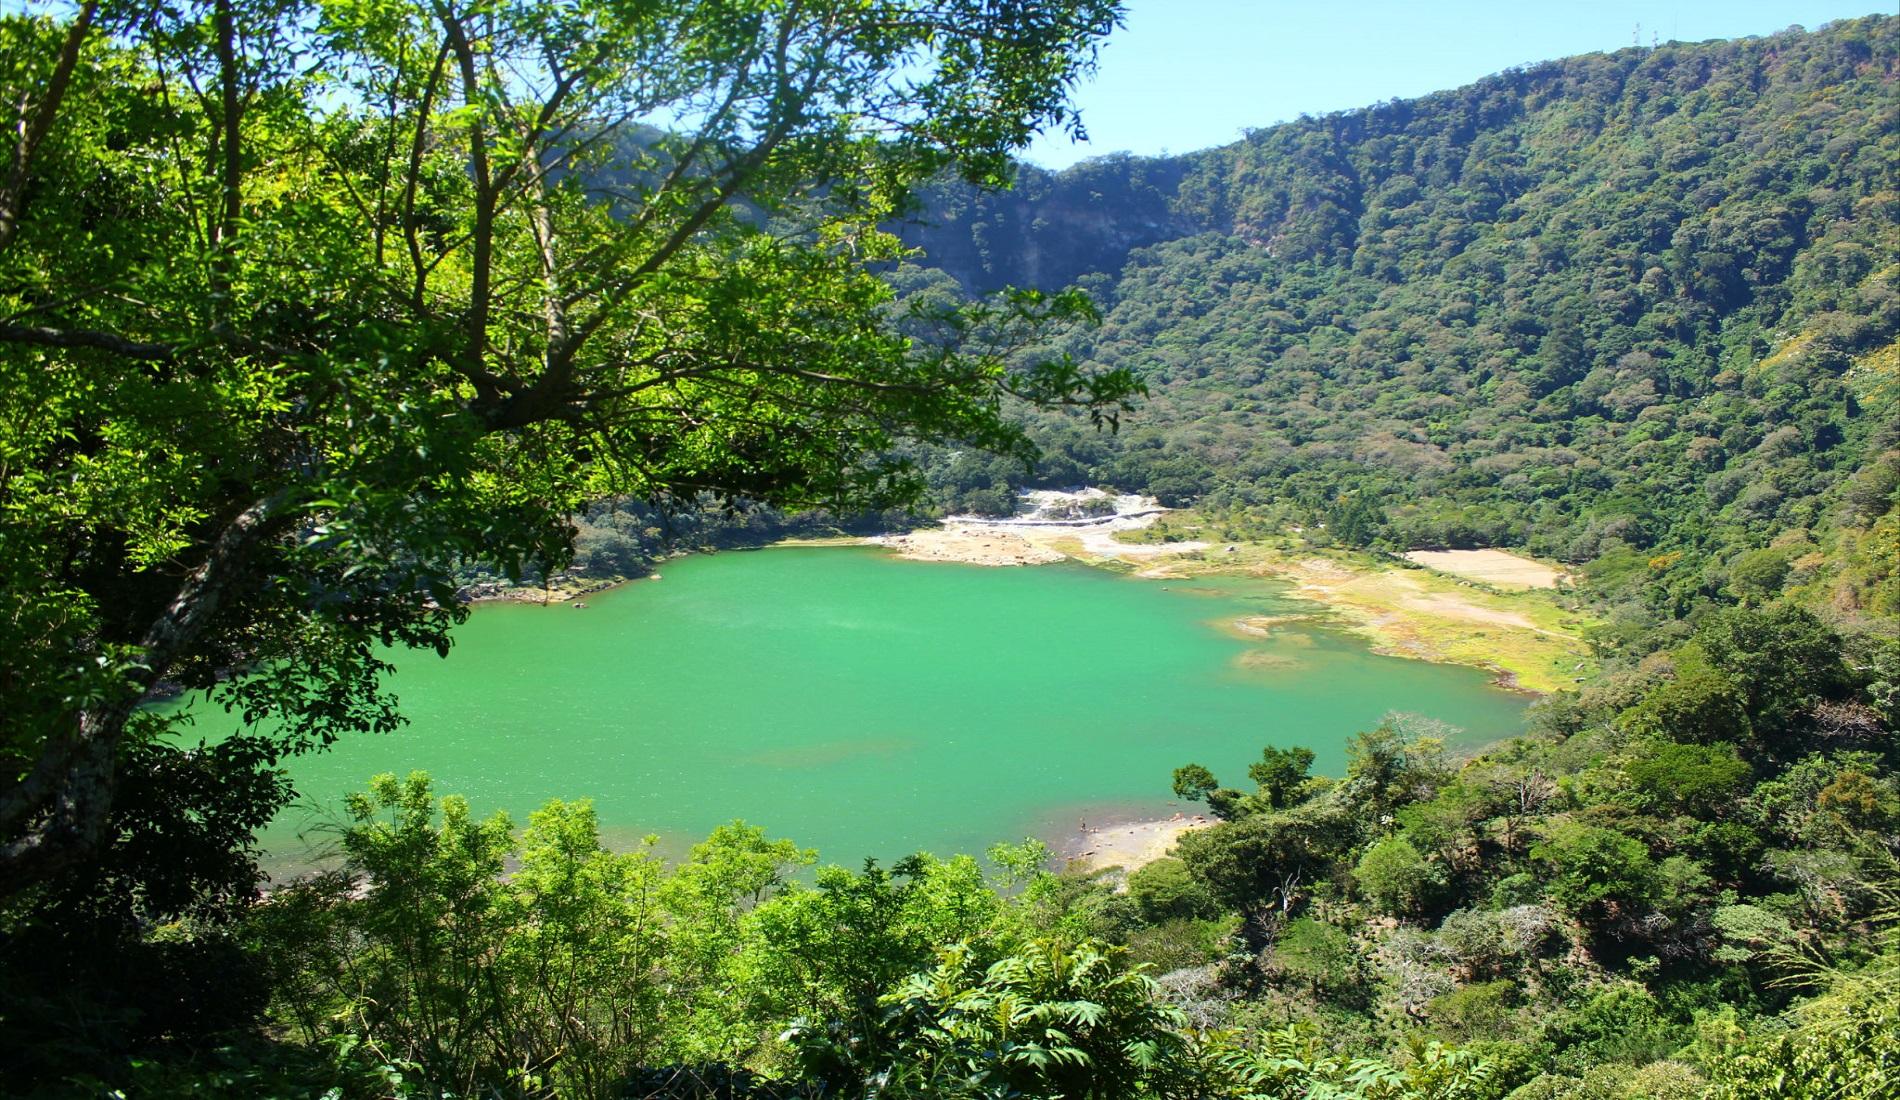 Lake Alegria El Salvador